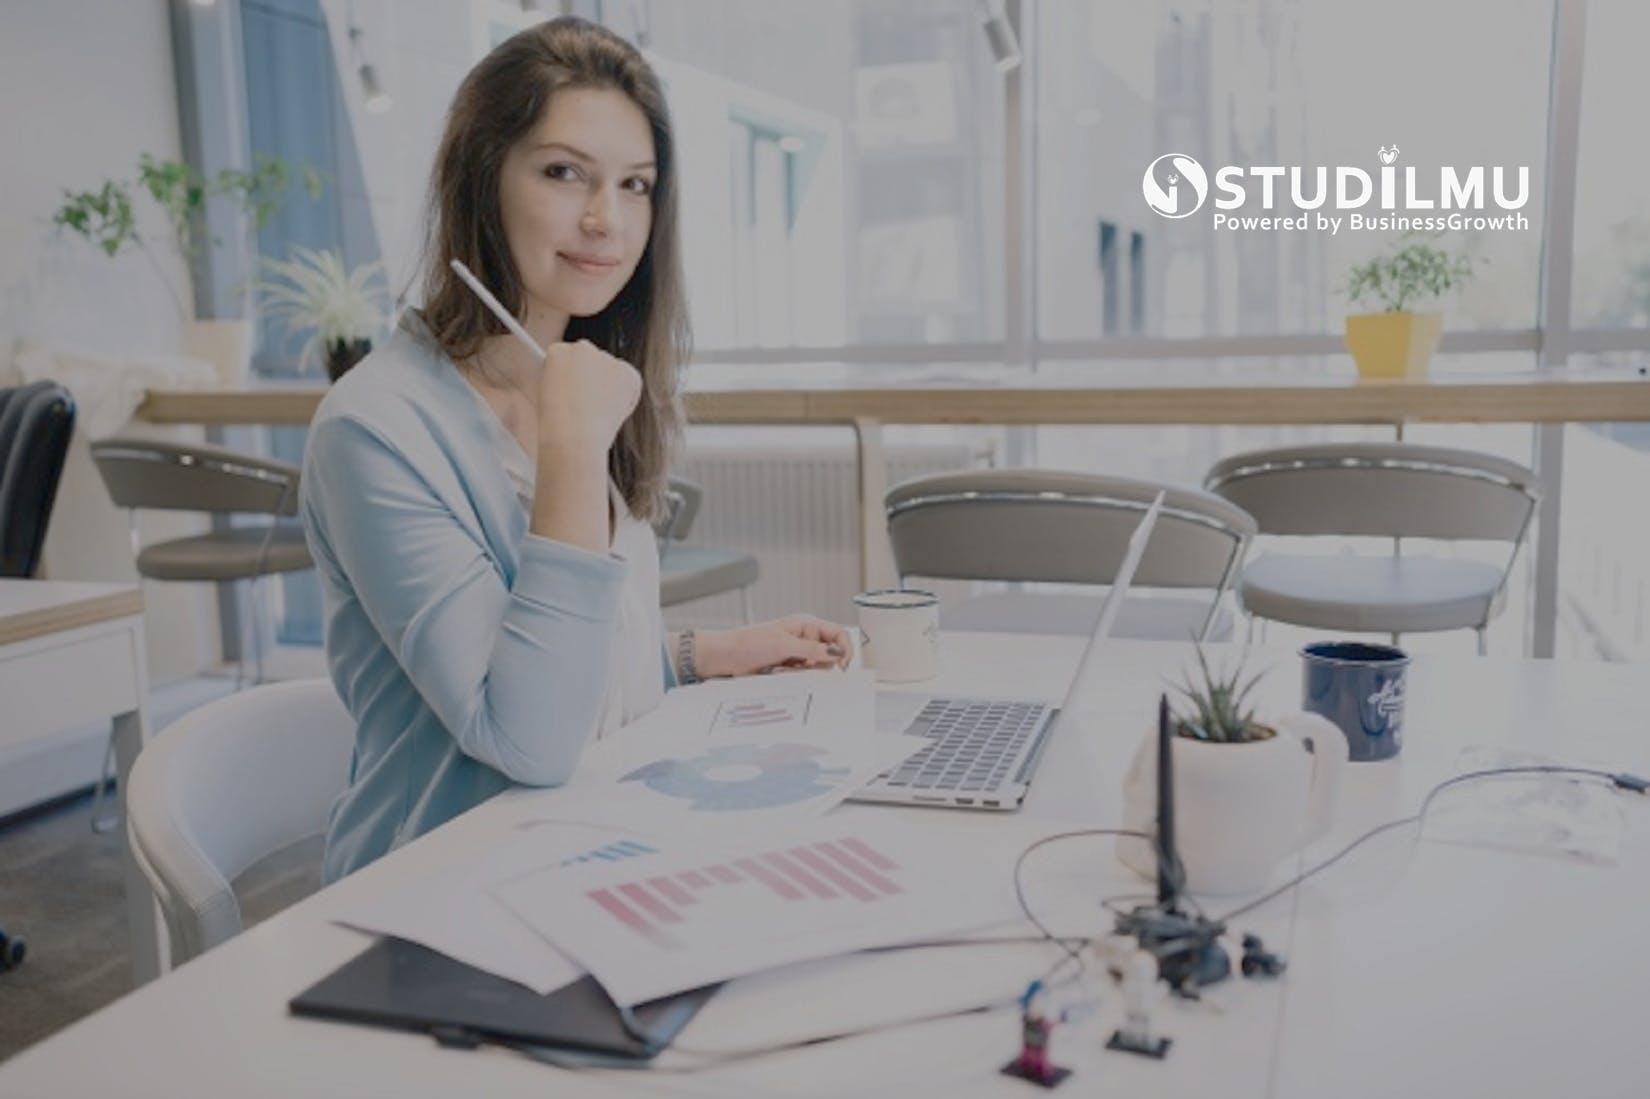 STUDILMU Career Advice - 3 Tanda Lingkungan Kerja yang Buruk dan Cara Menghadapinya